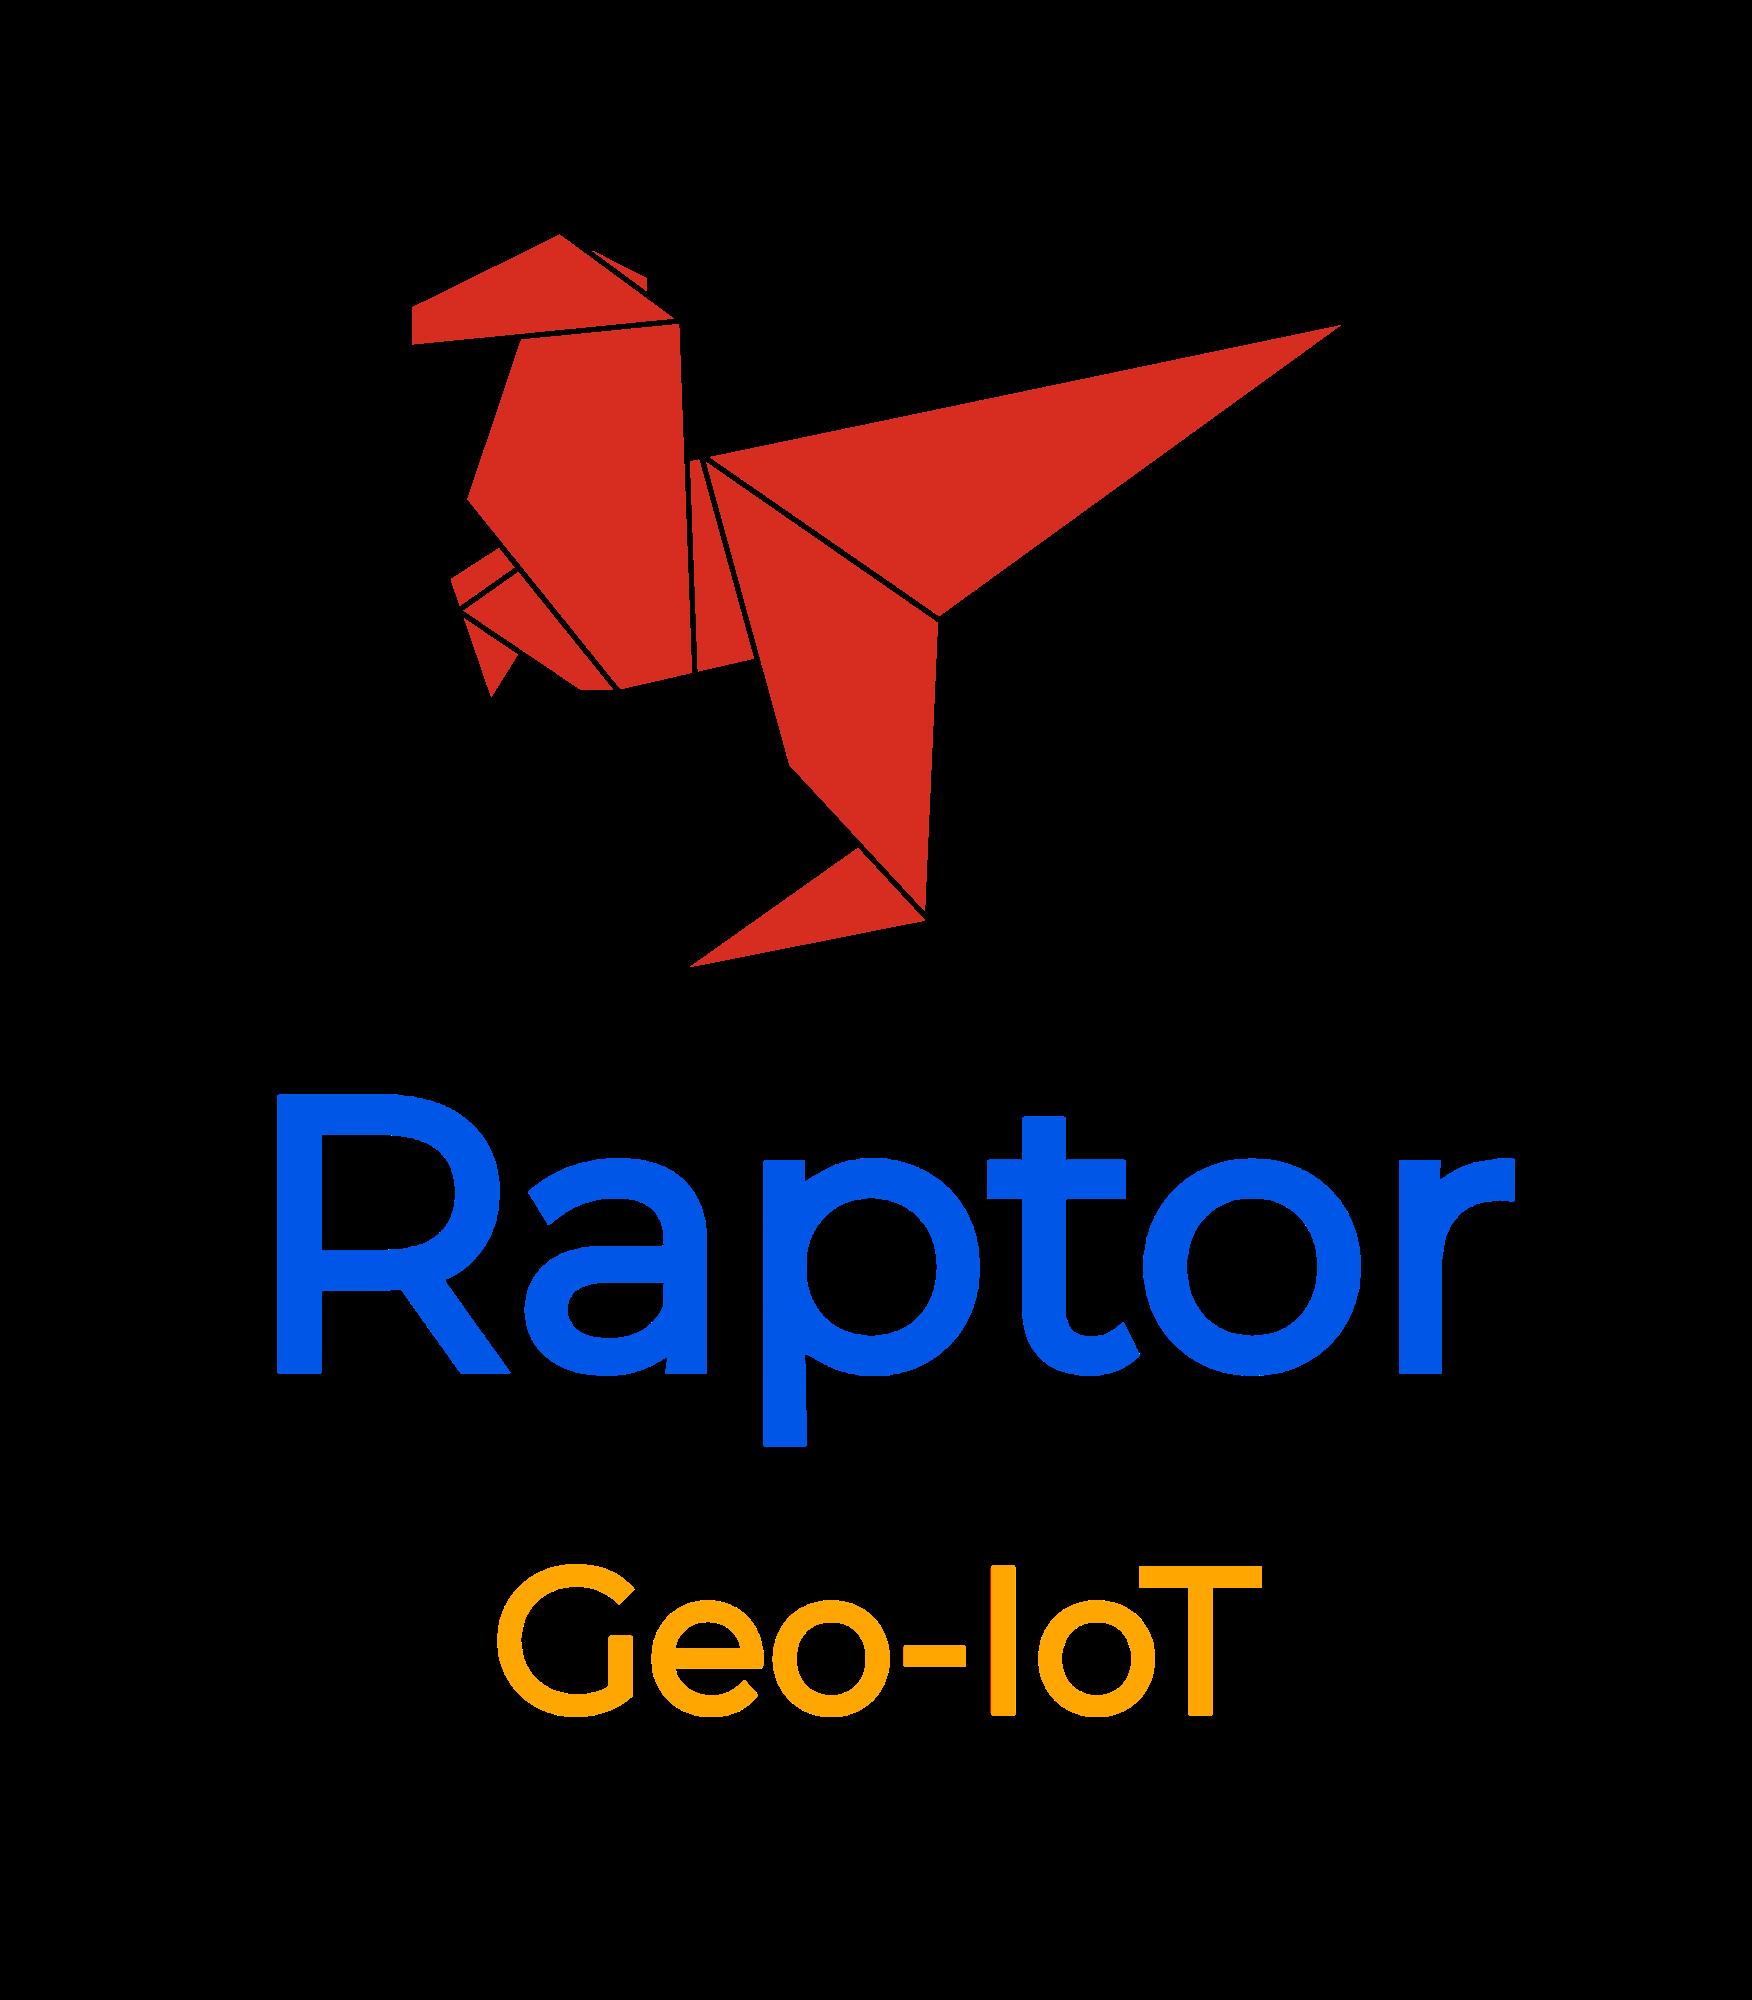 Copy of Copy of Raptor-logo1.png